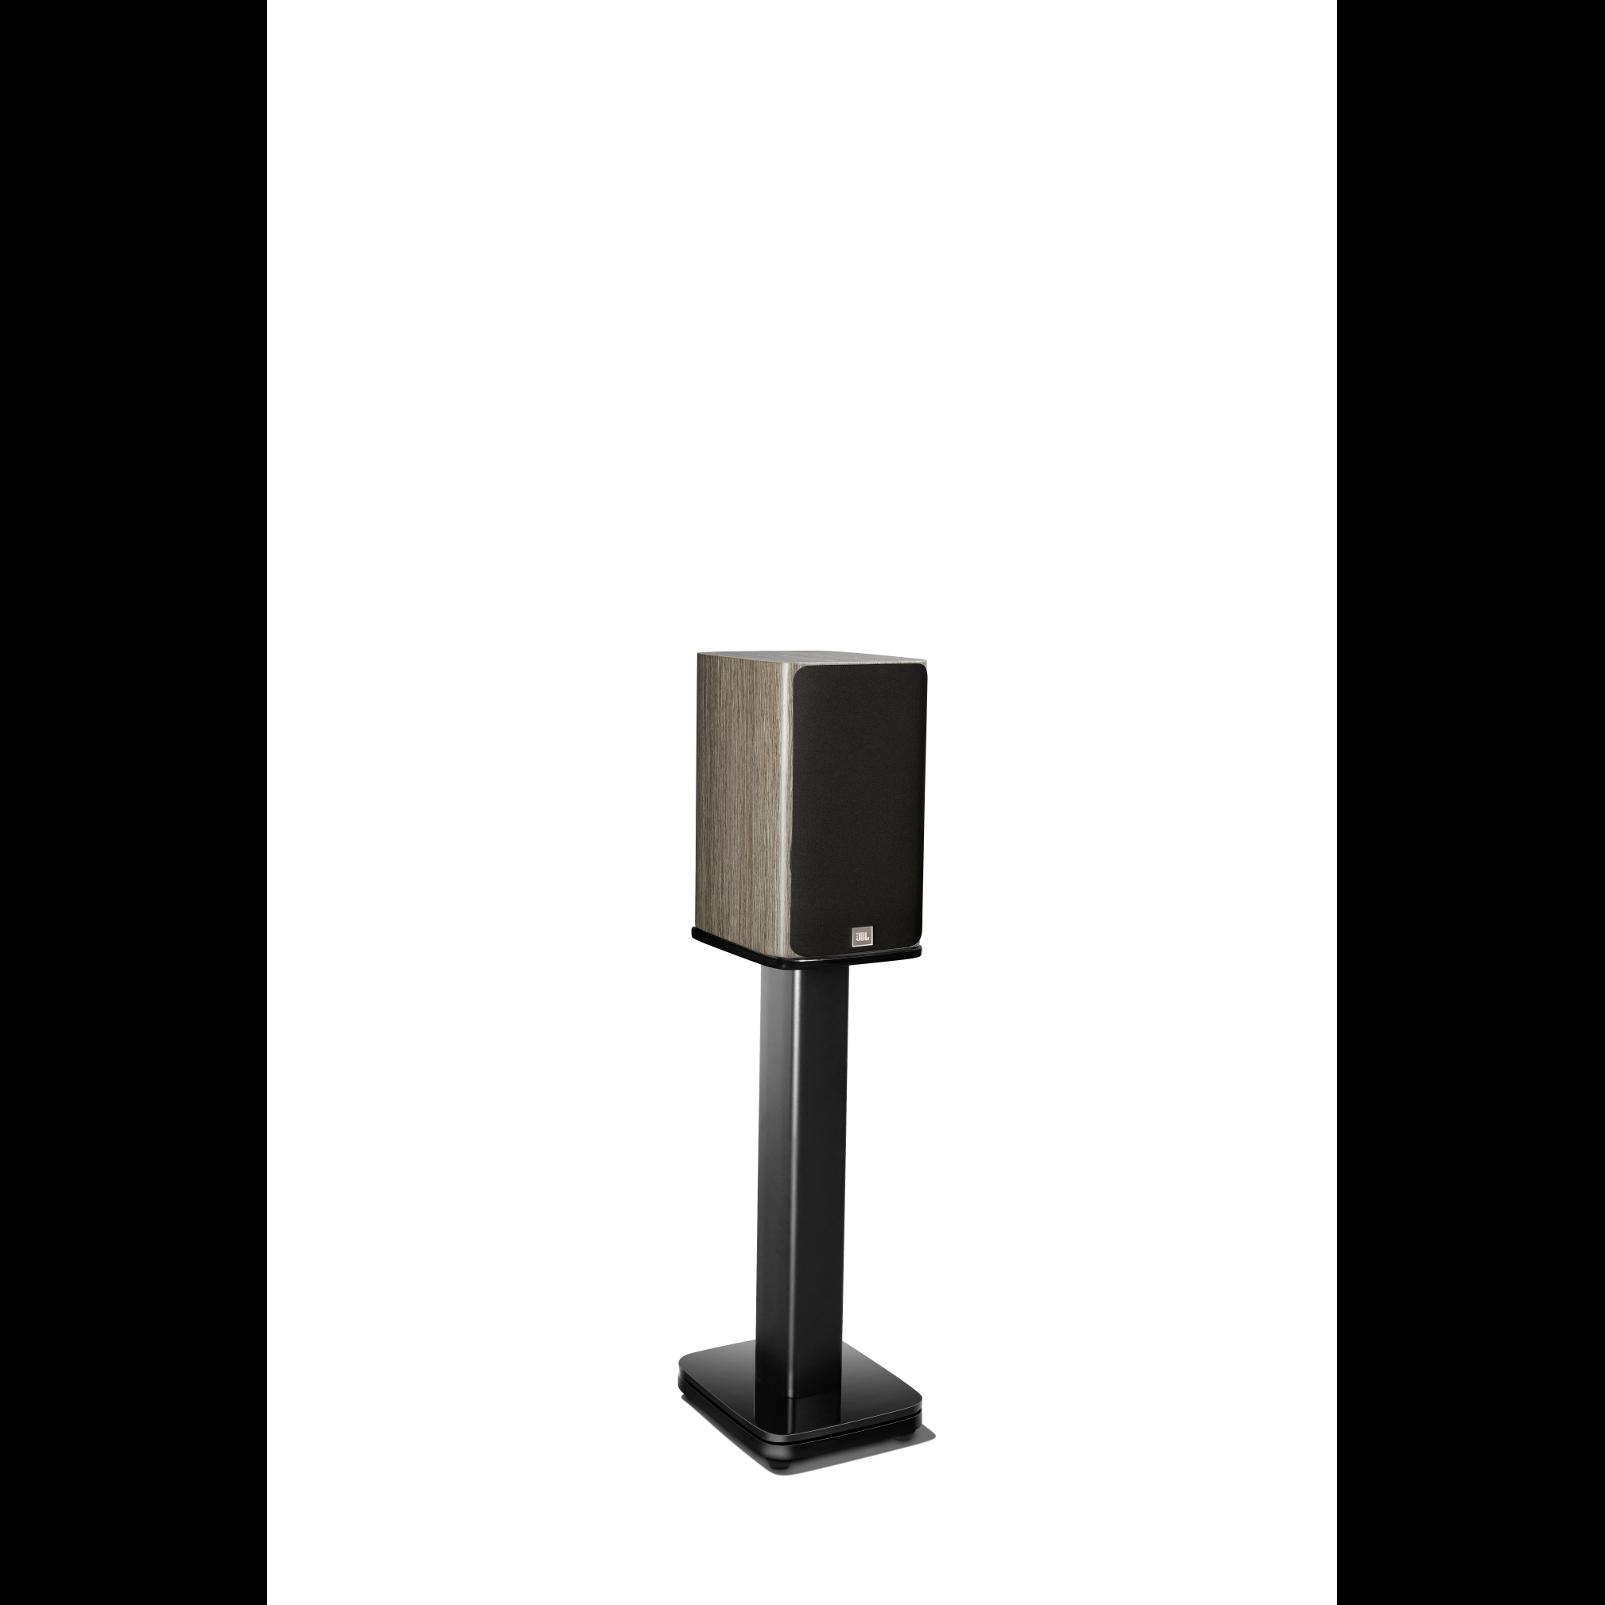 HDI-1600 - Grey Oak - 2-way 6.5-inch (165mm) Bookshelf Loudspeaker - Left